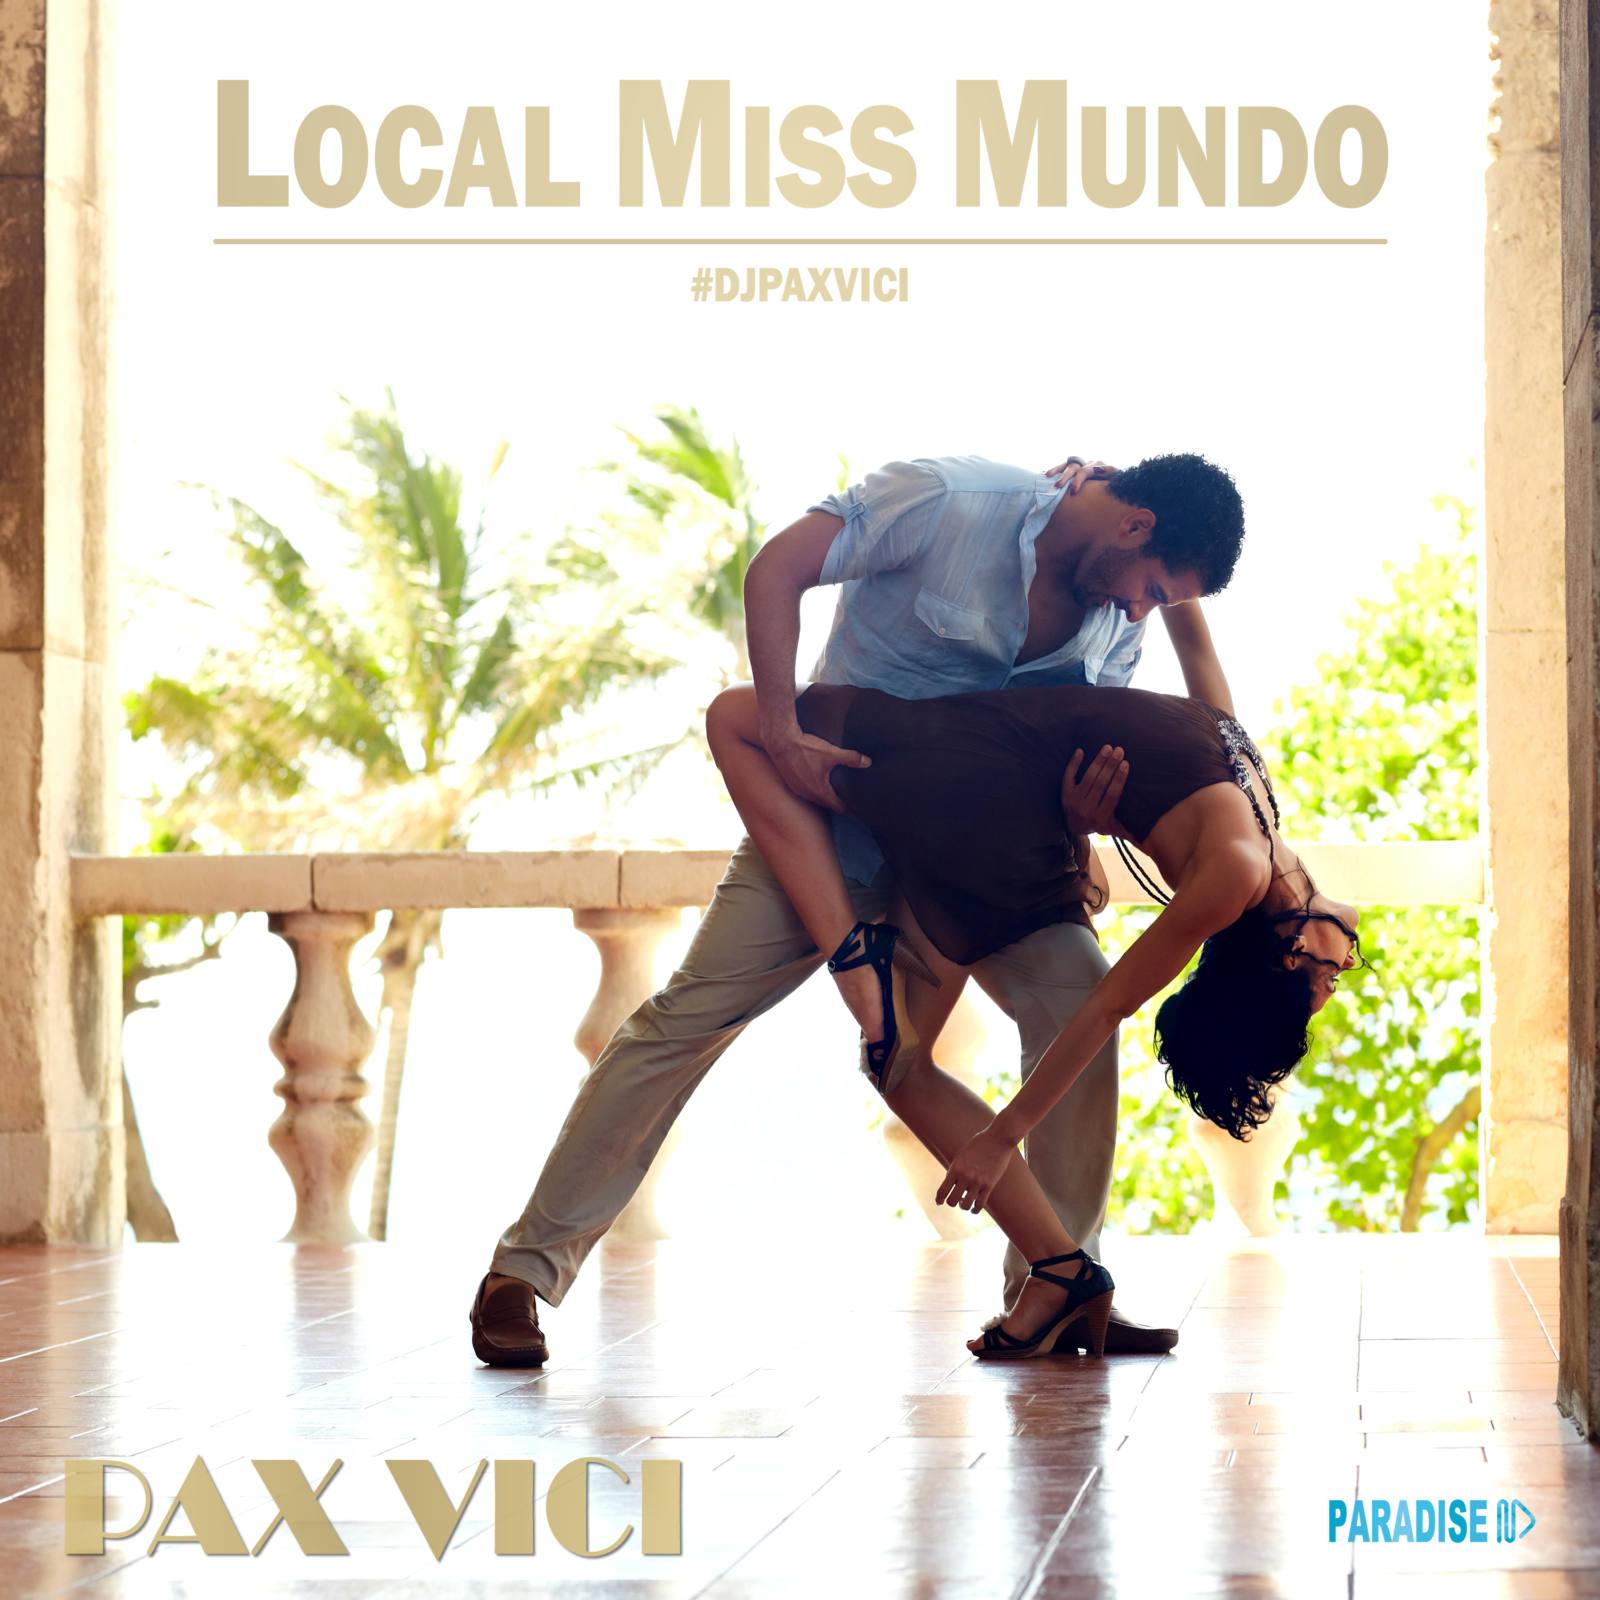 Pax Vici - Local Miss Mundo